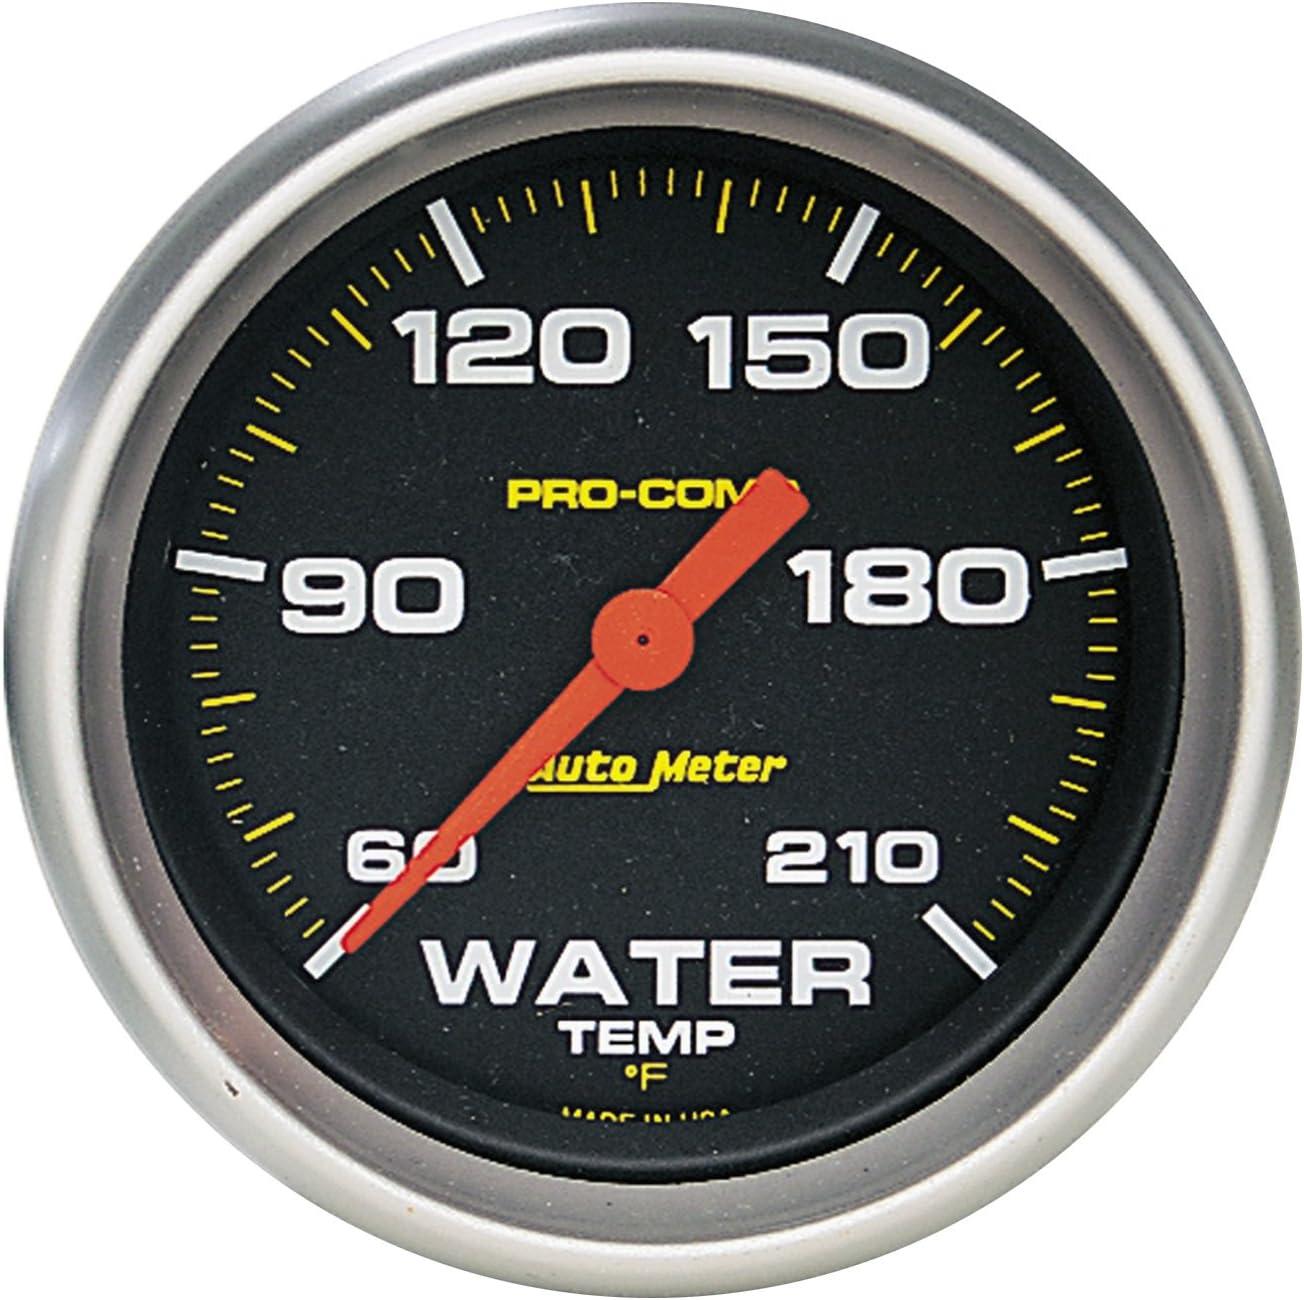 AUTO Phoenix Mall METER Max 64% OFF 5469 Pro-Comp Gauge Temperature Water Electric